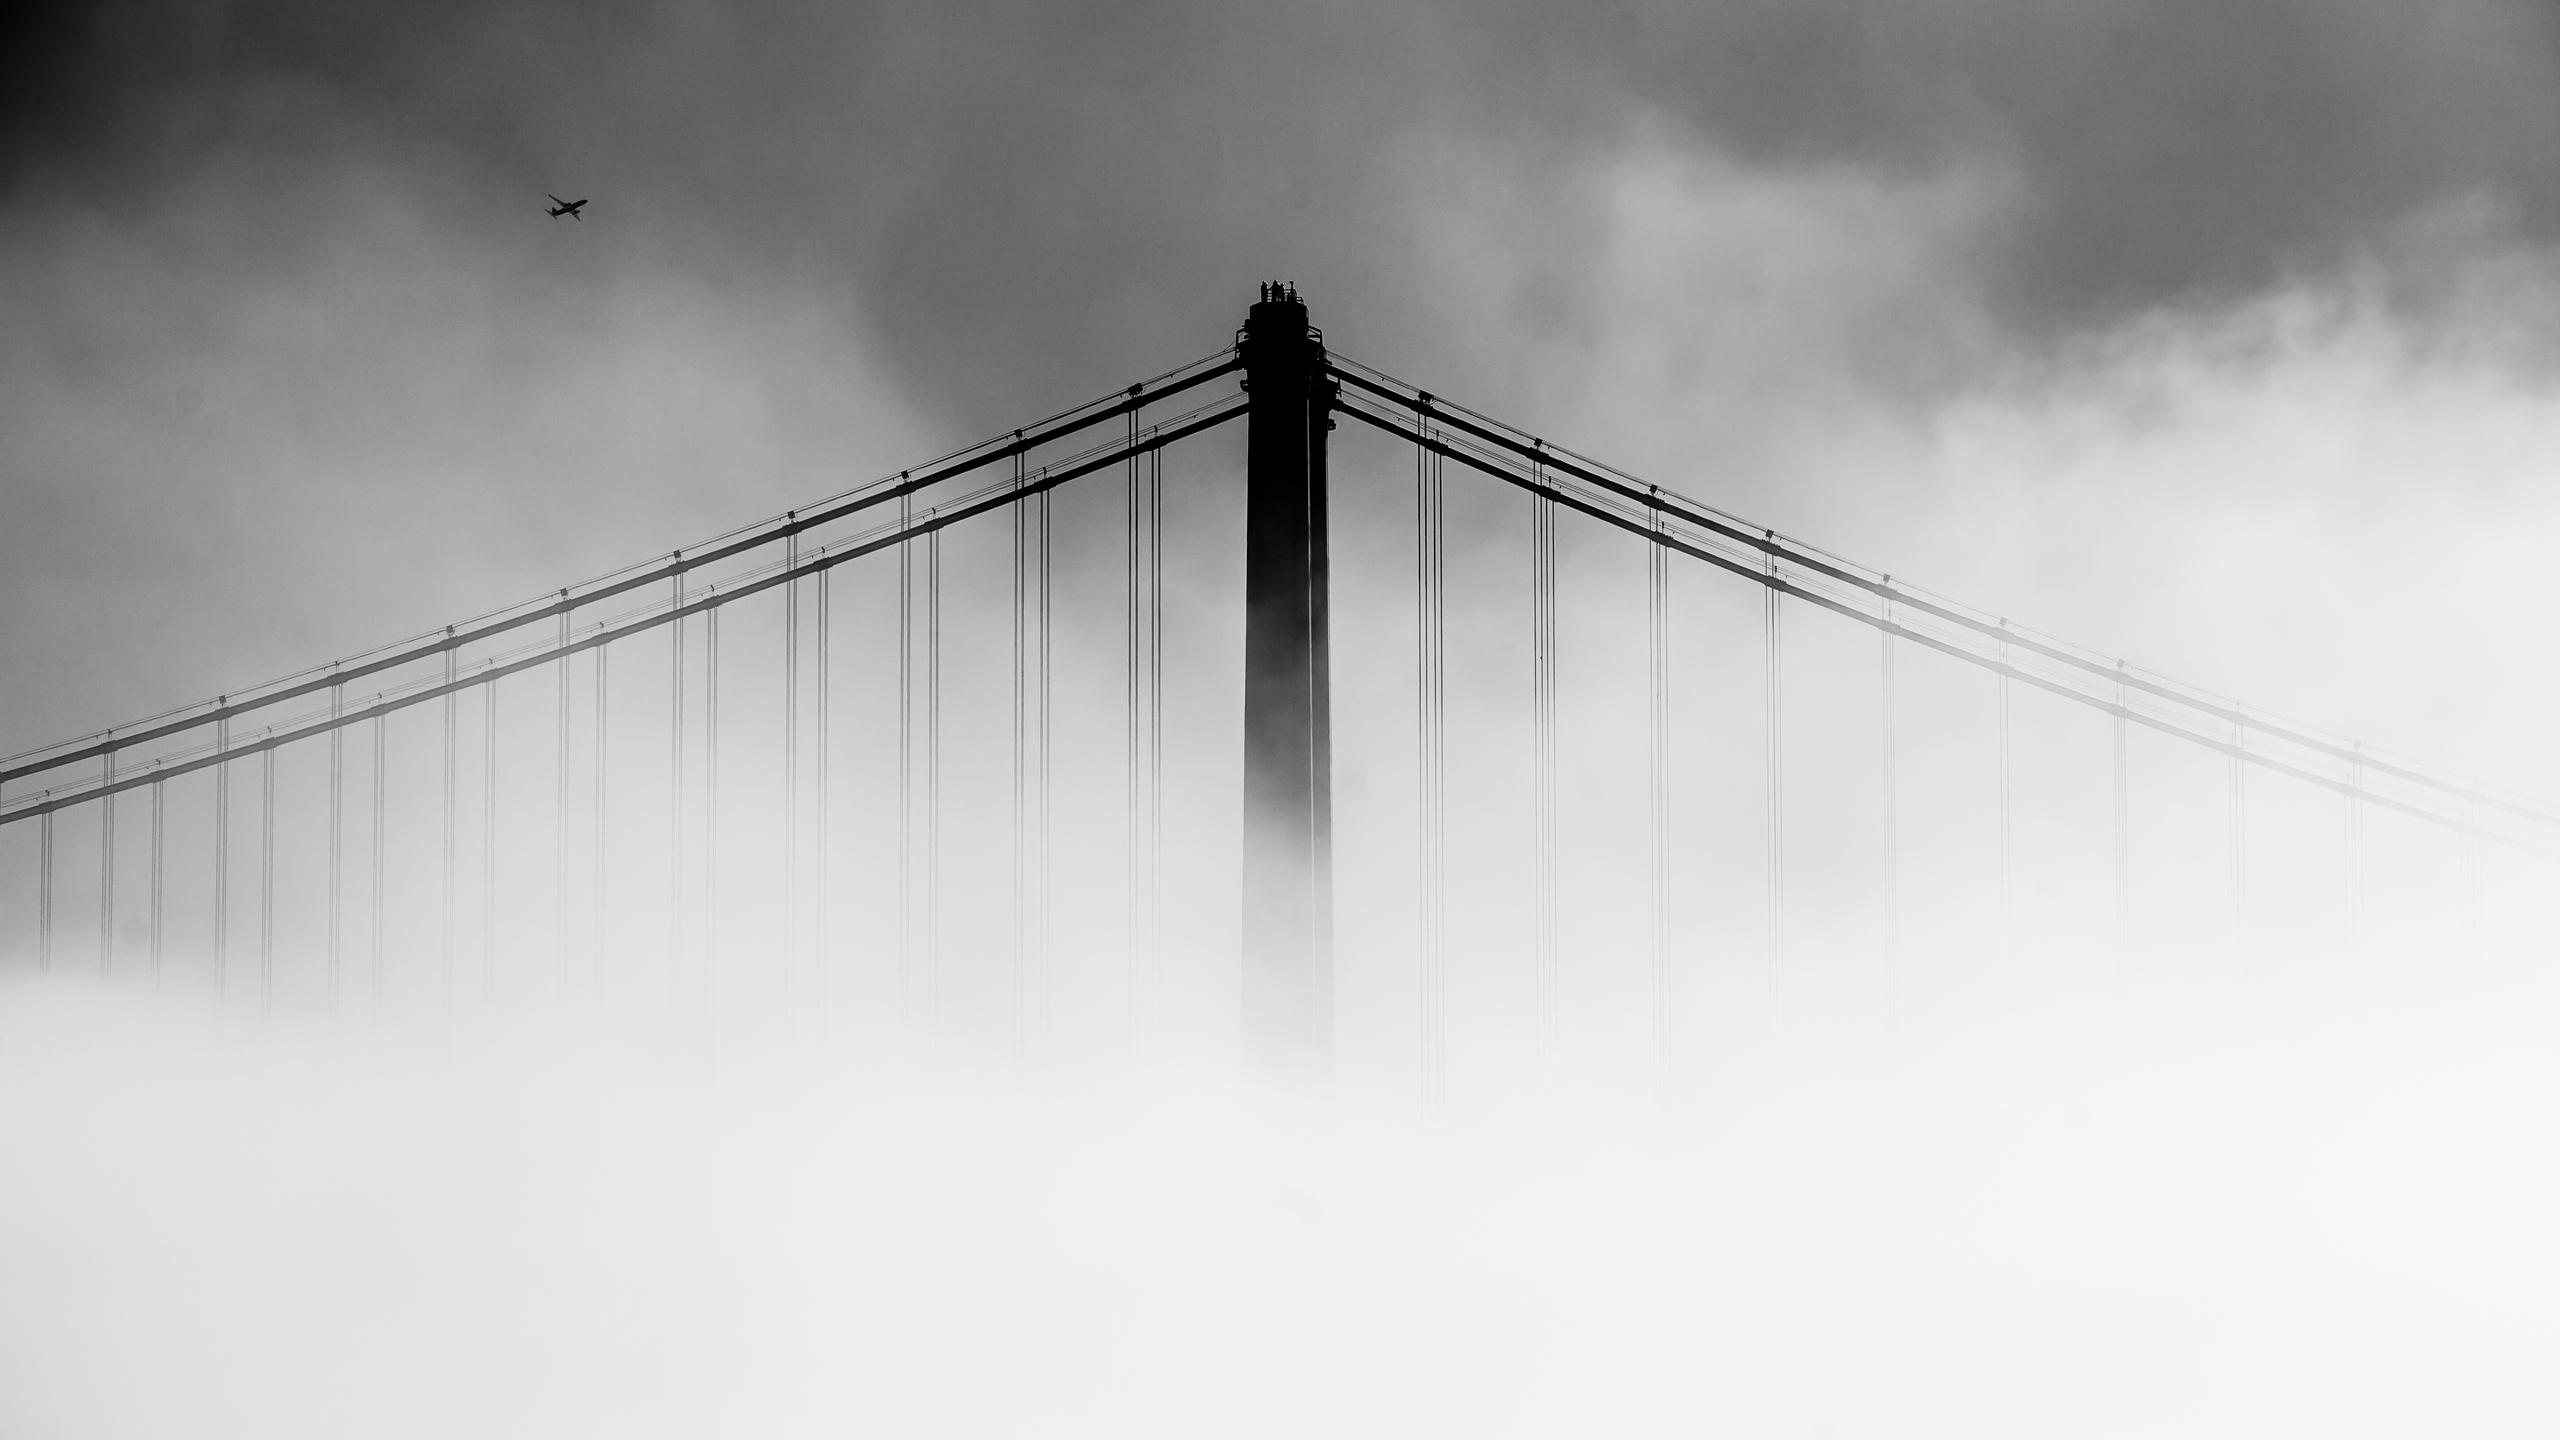 san-francisco-oakland-bay-bridge-covered-with-fog-qg.jpg